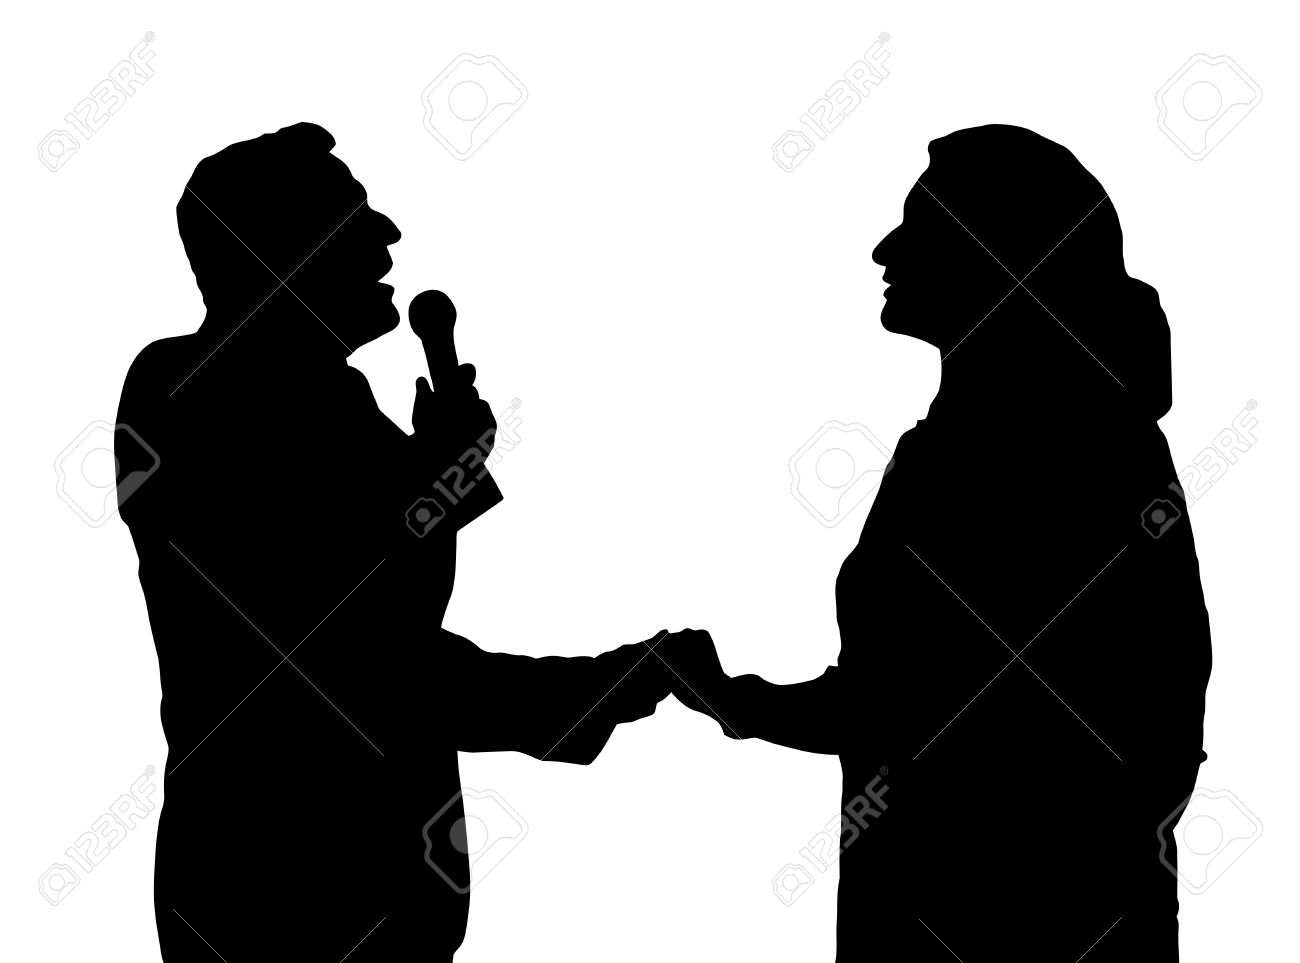 Duet Penyanyi Indonesia Yang Akan Selalu Dikenang Kumpulan Artikel Unik Dan Menarik